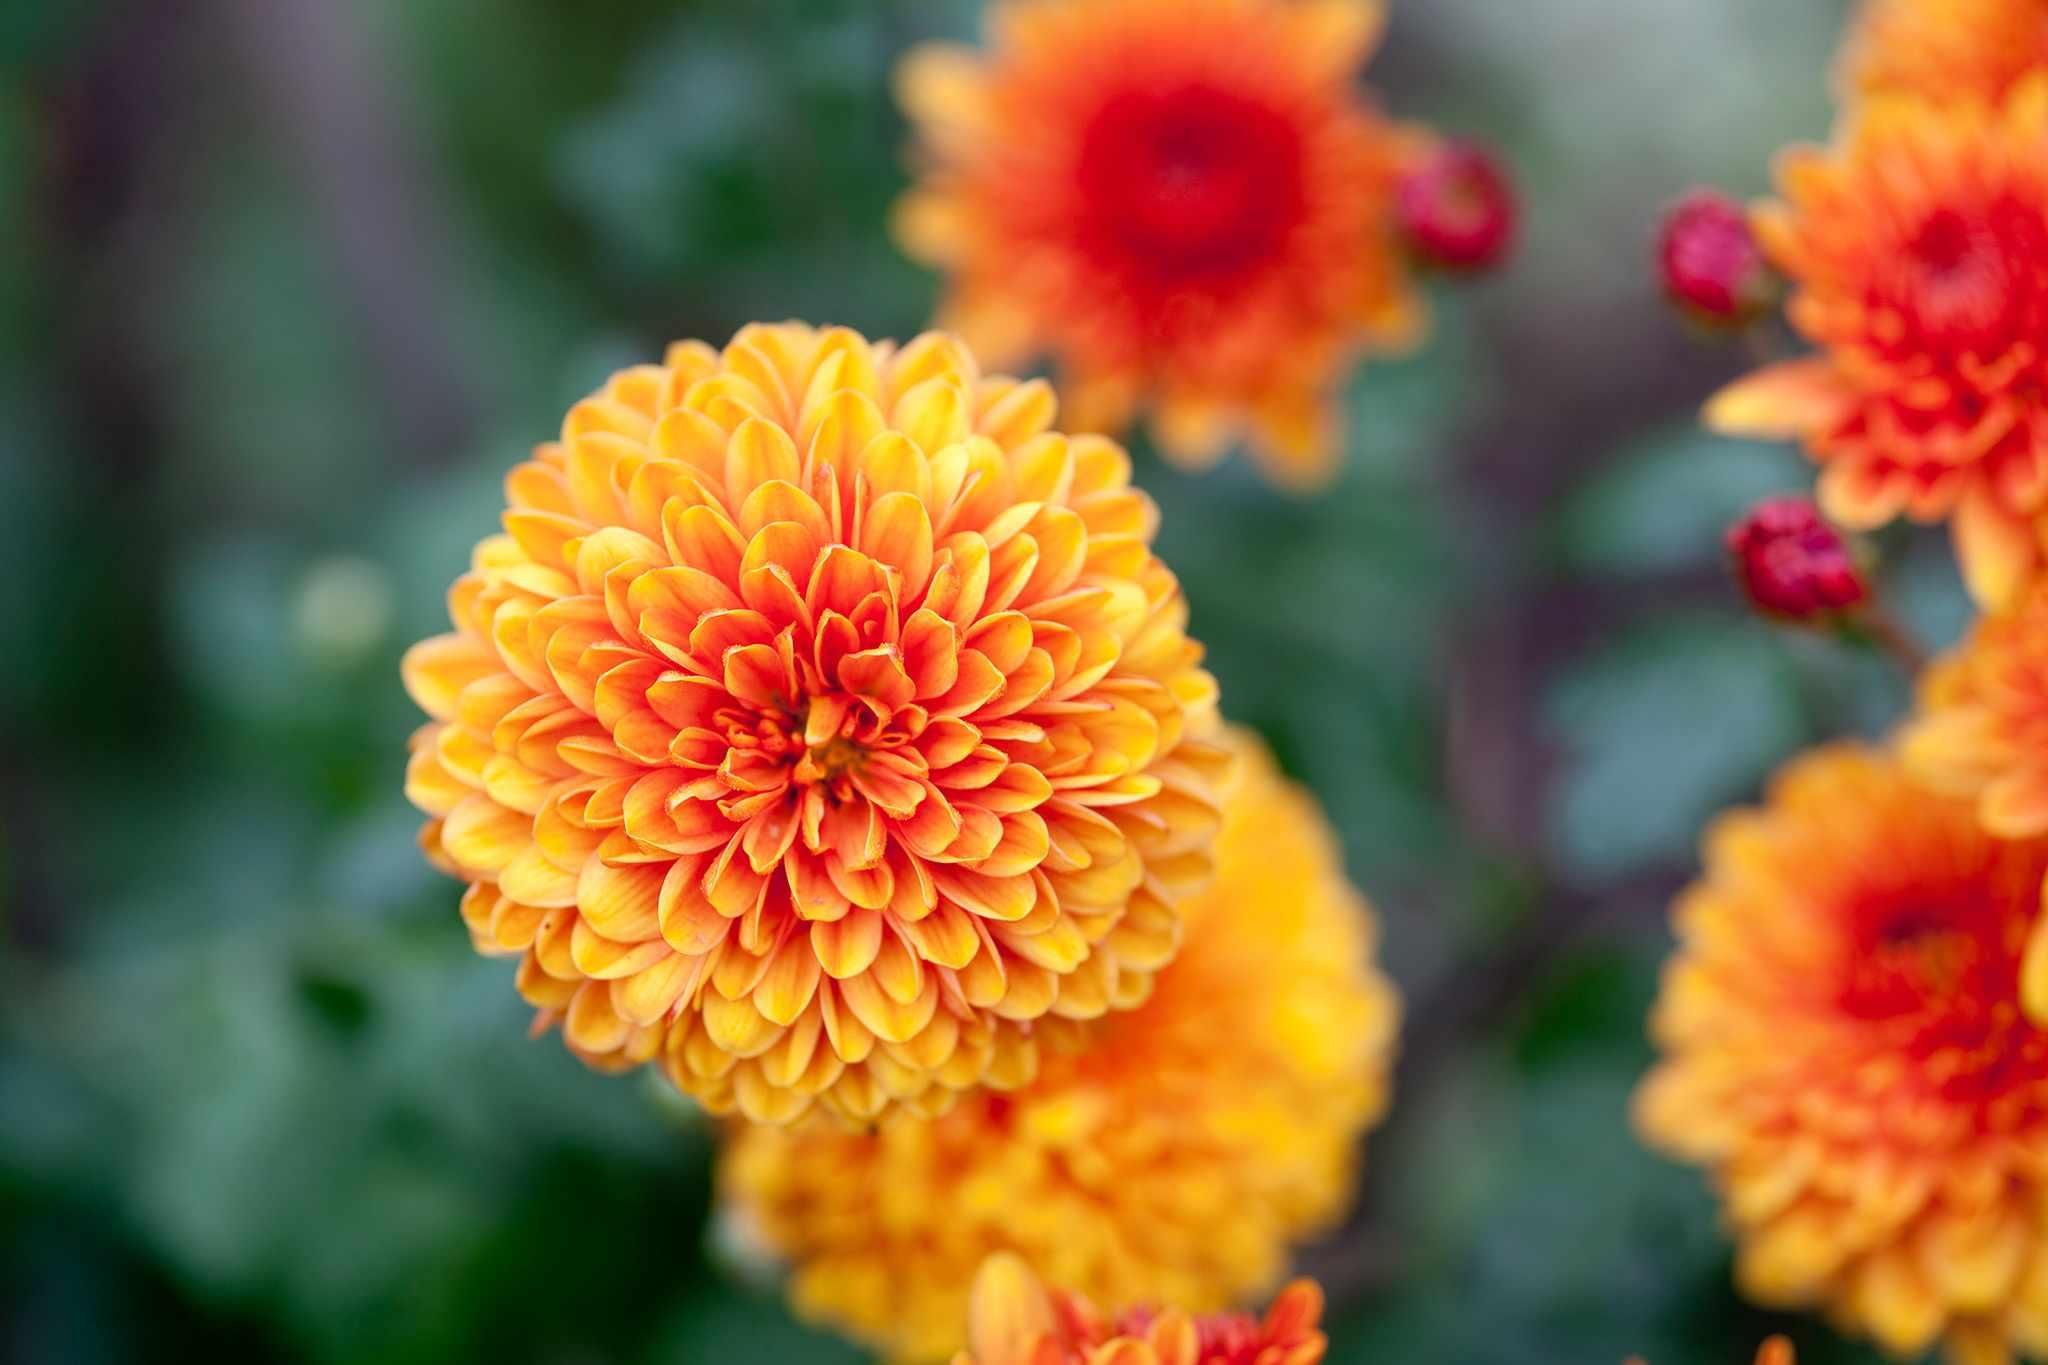 Orange chrysanthemum in flower